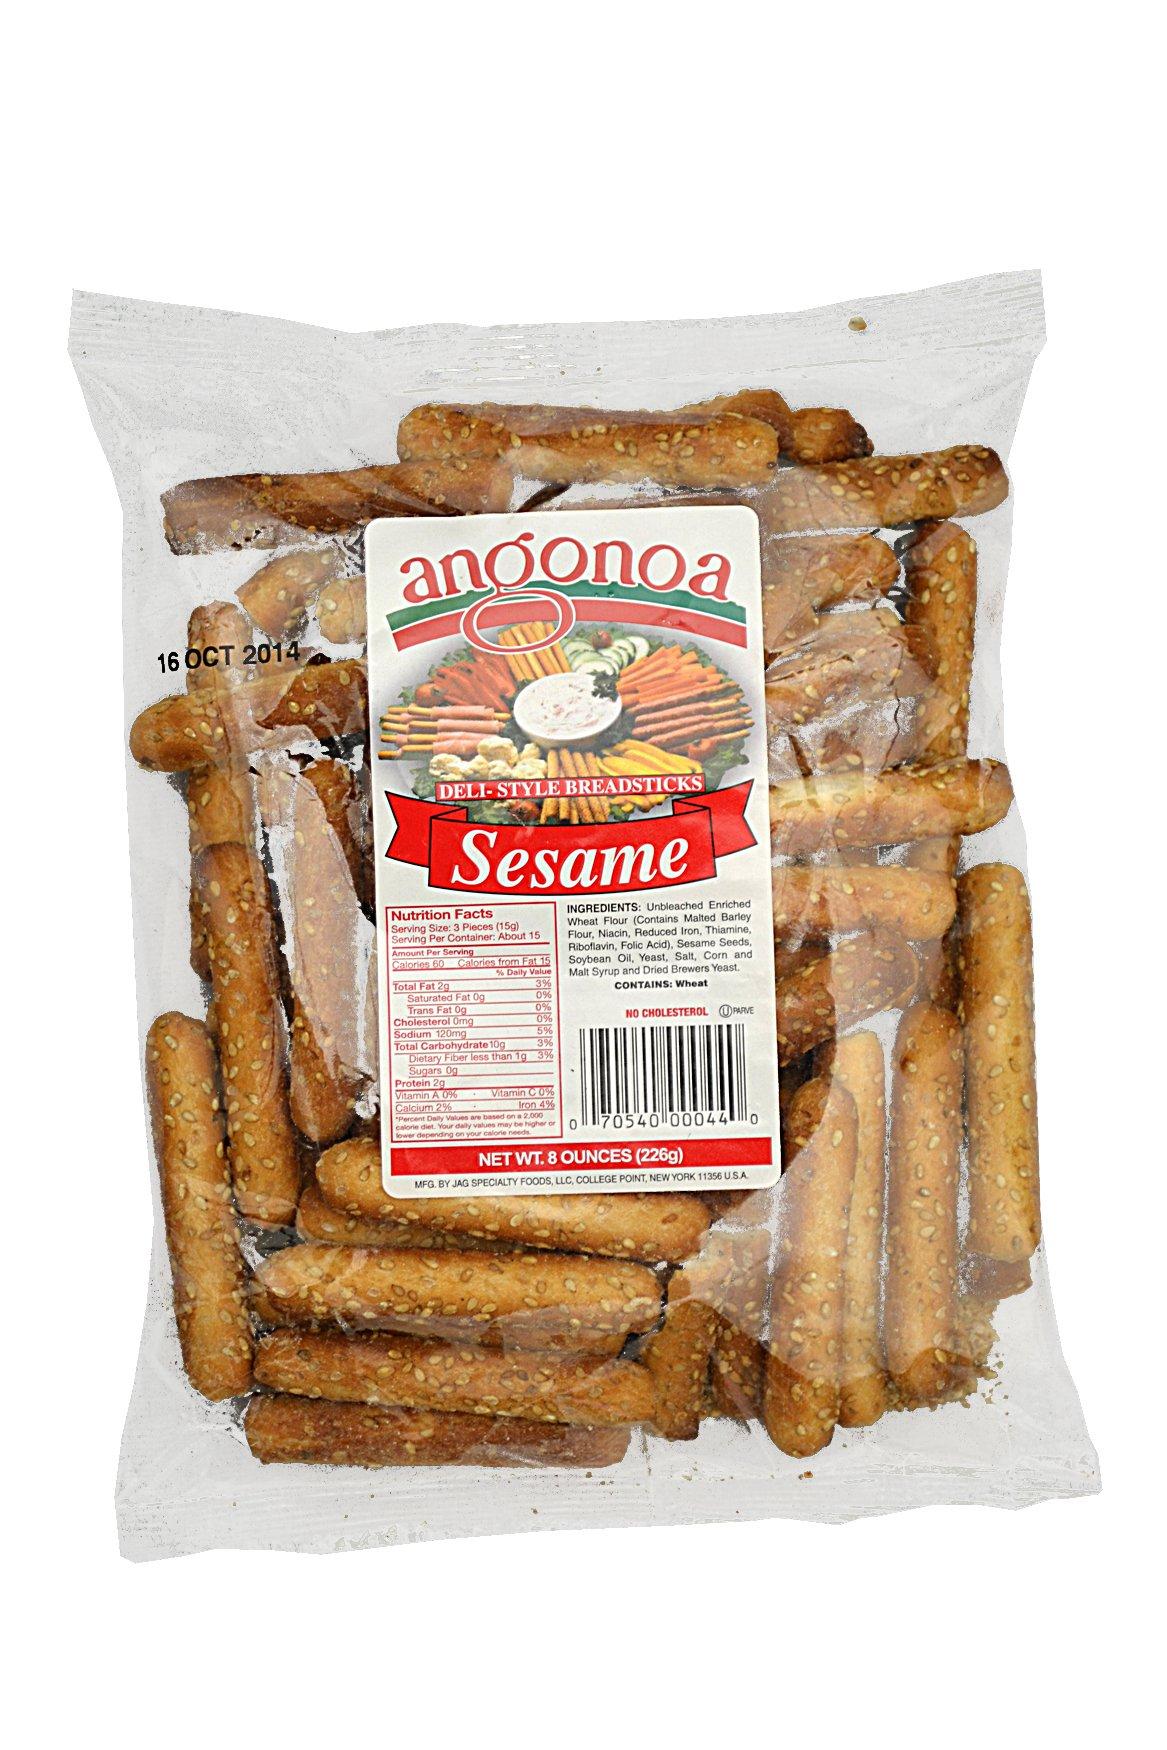 Angonoa's Breadsticks Bag, Sesame, 8 Ounce (Pack of 12)